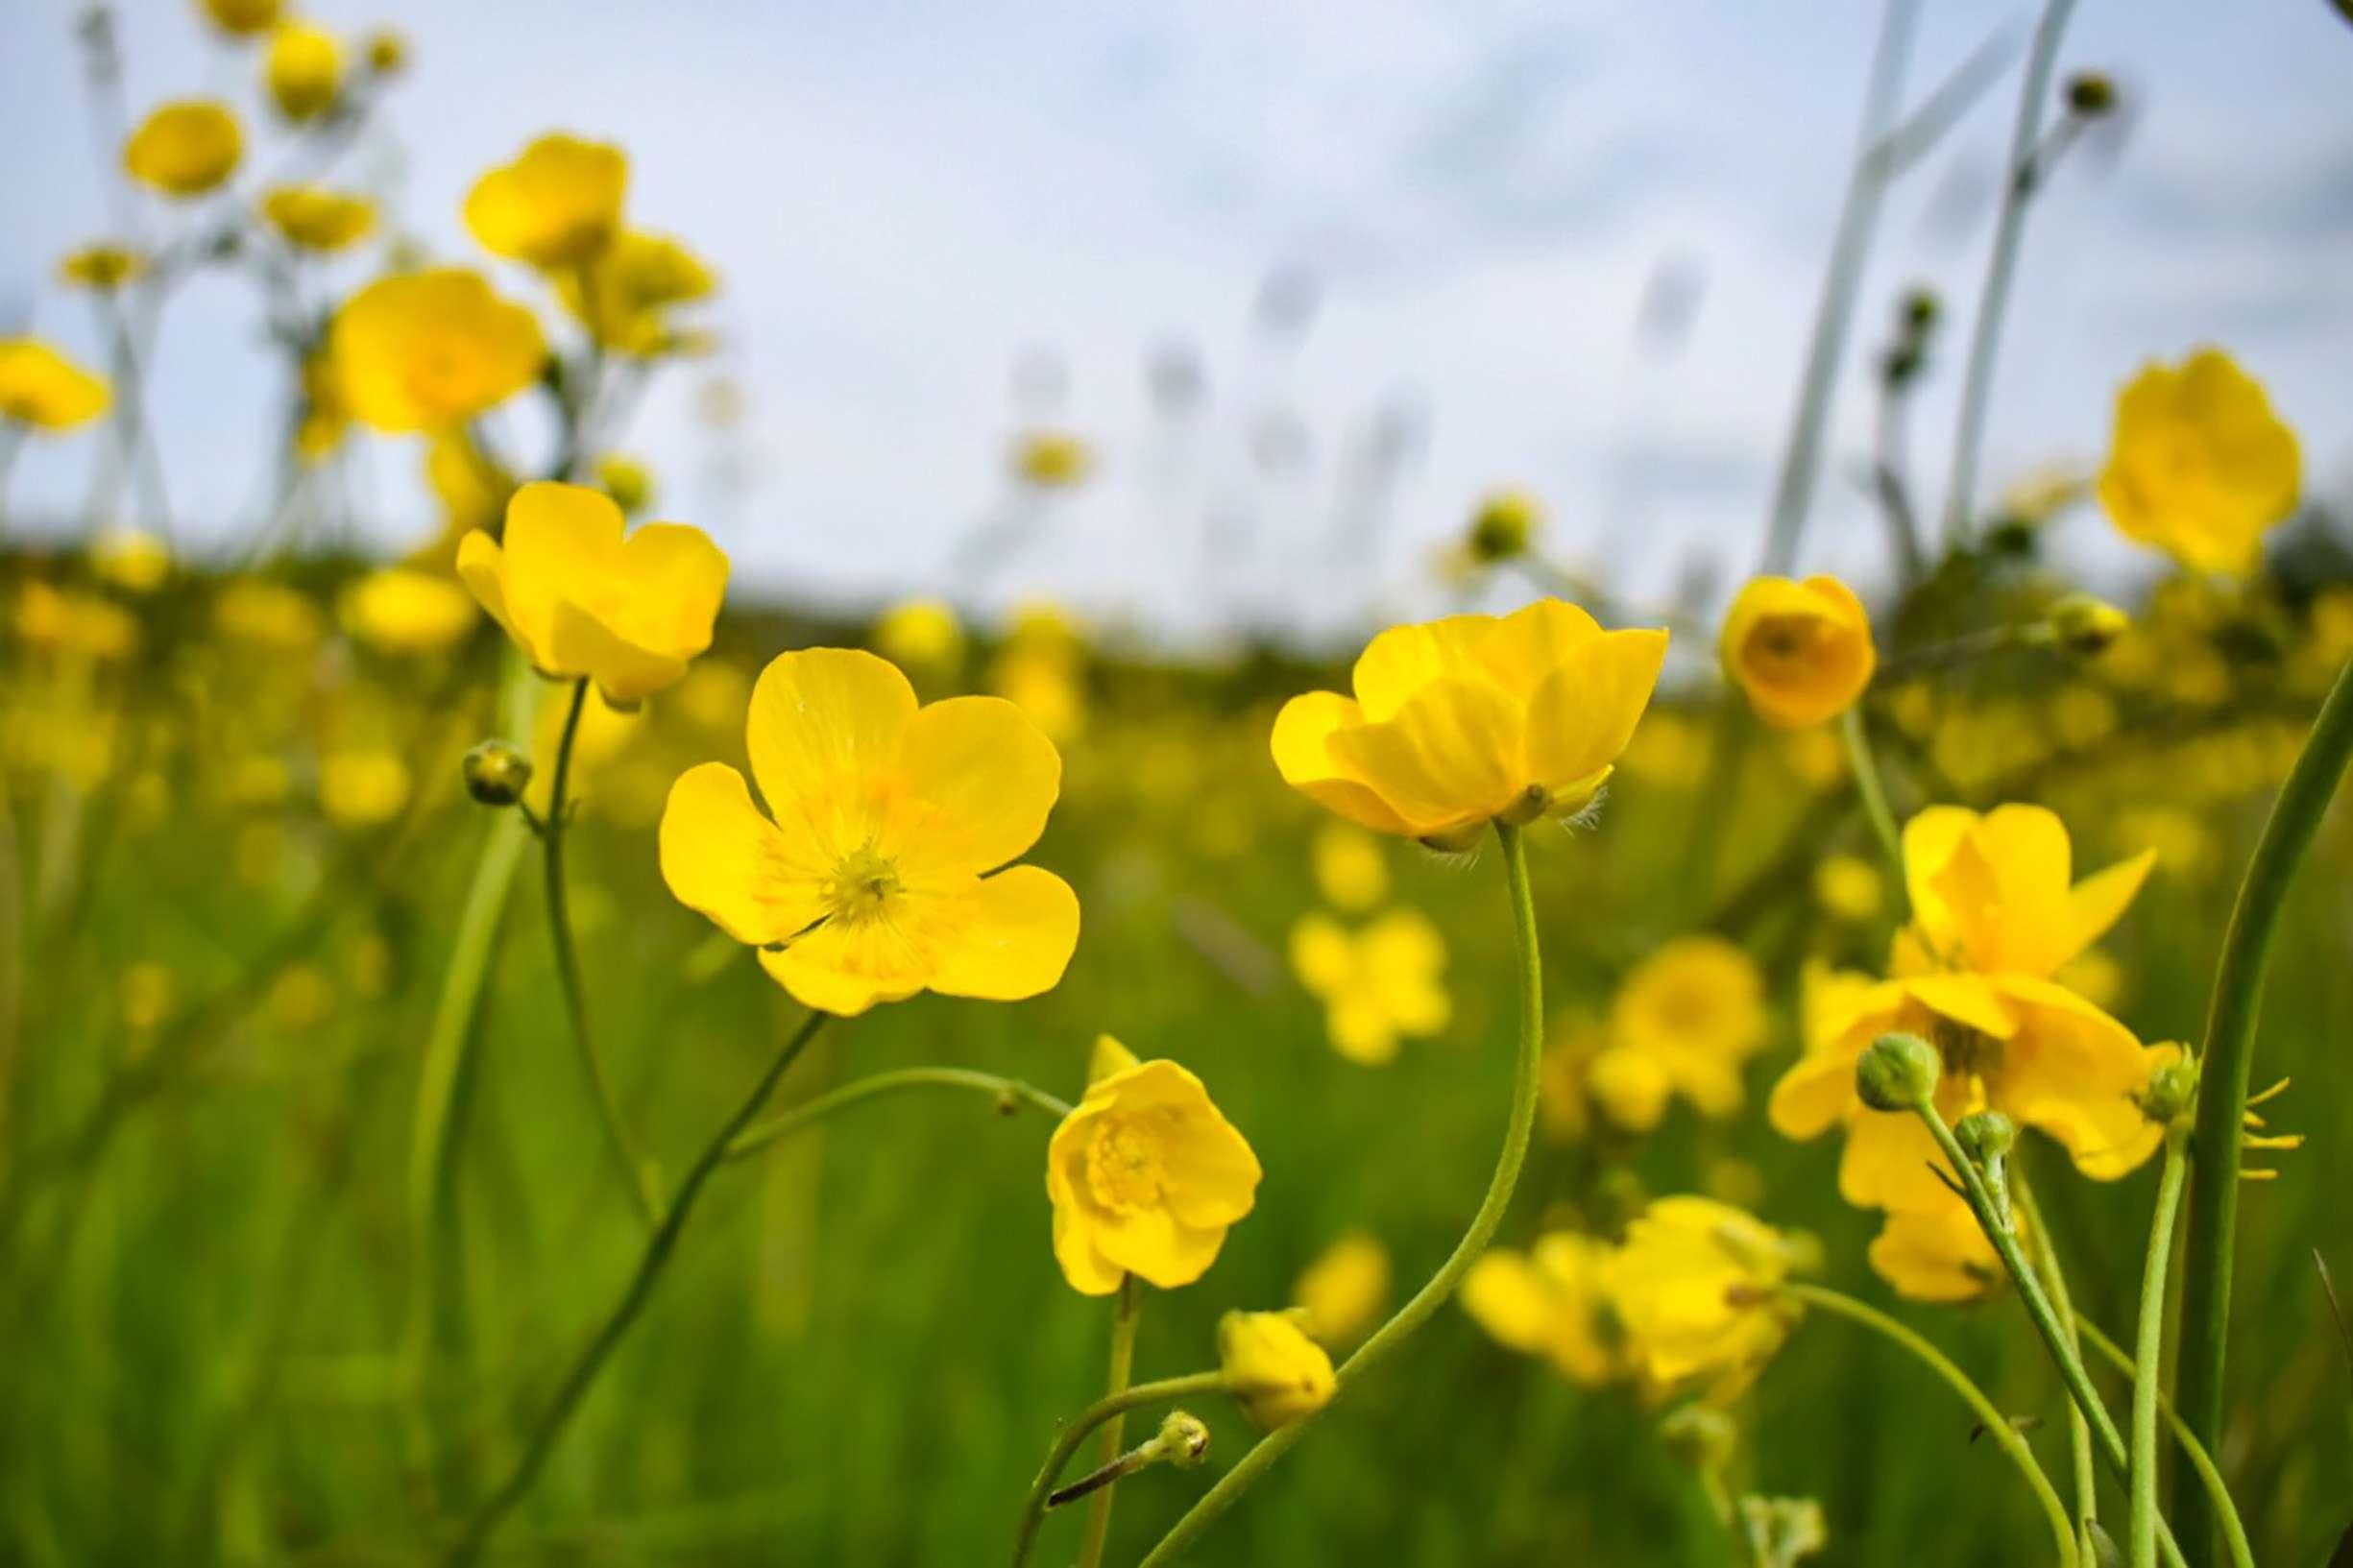 Field of yellow buttercups